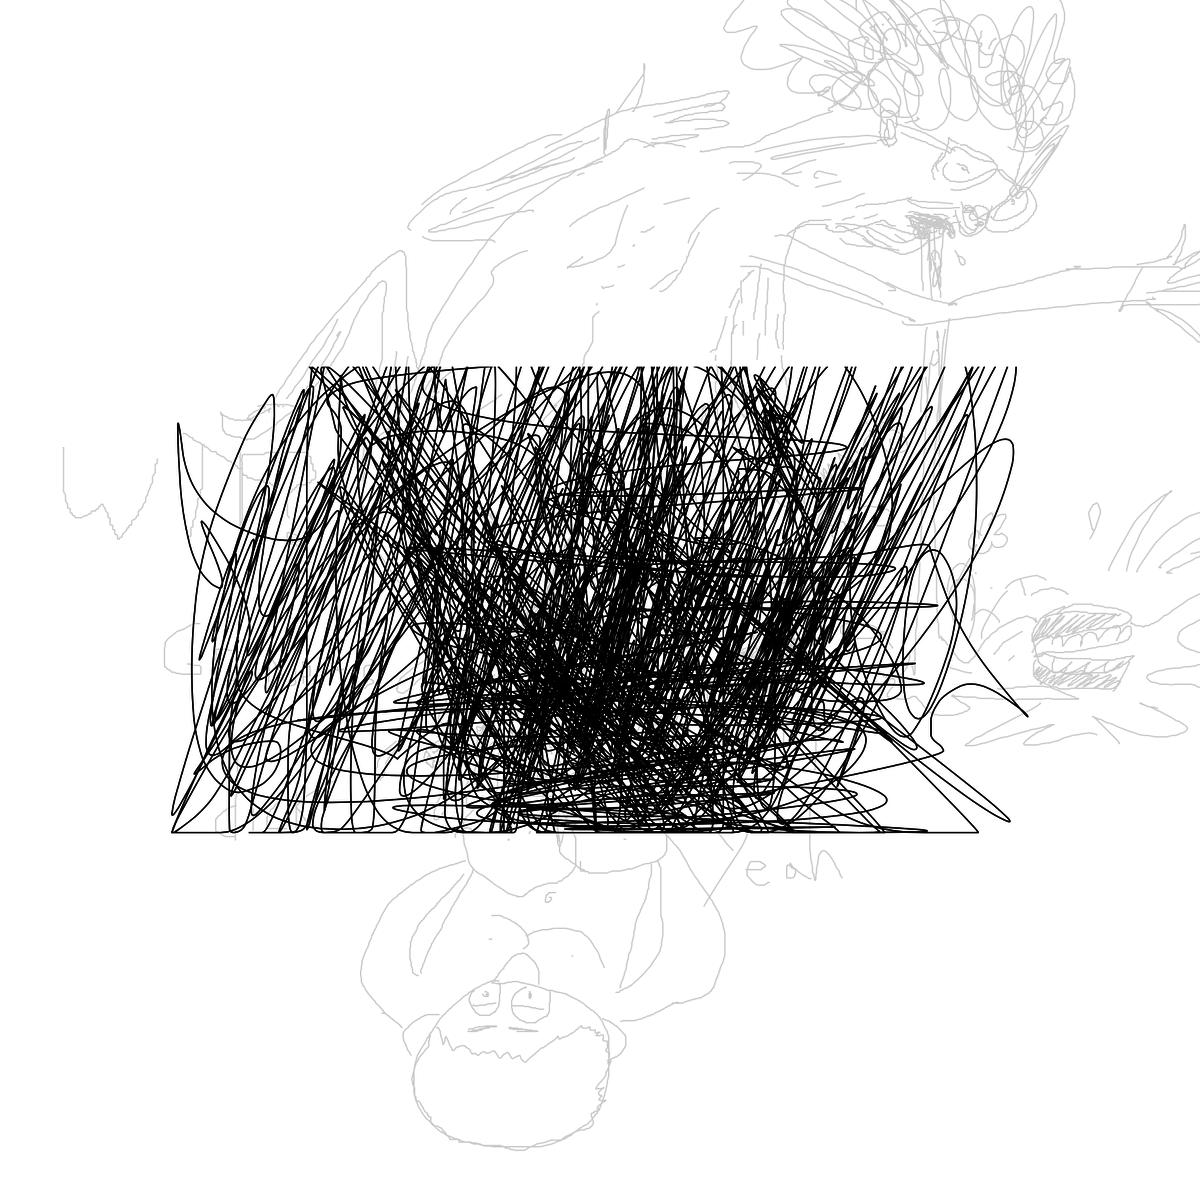 BAAAM drawing#4950 lat:32.9543151855468750lng: -96.7624282836914000